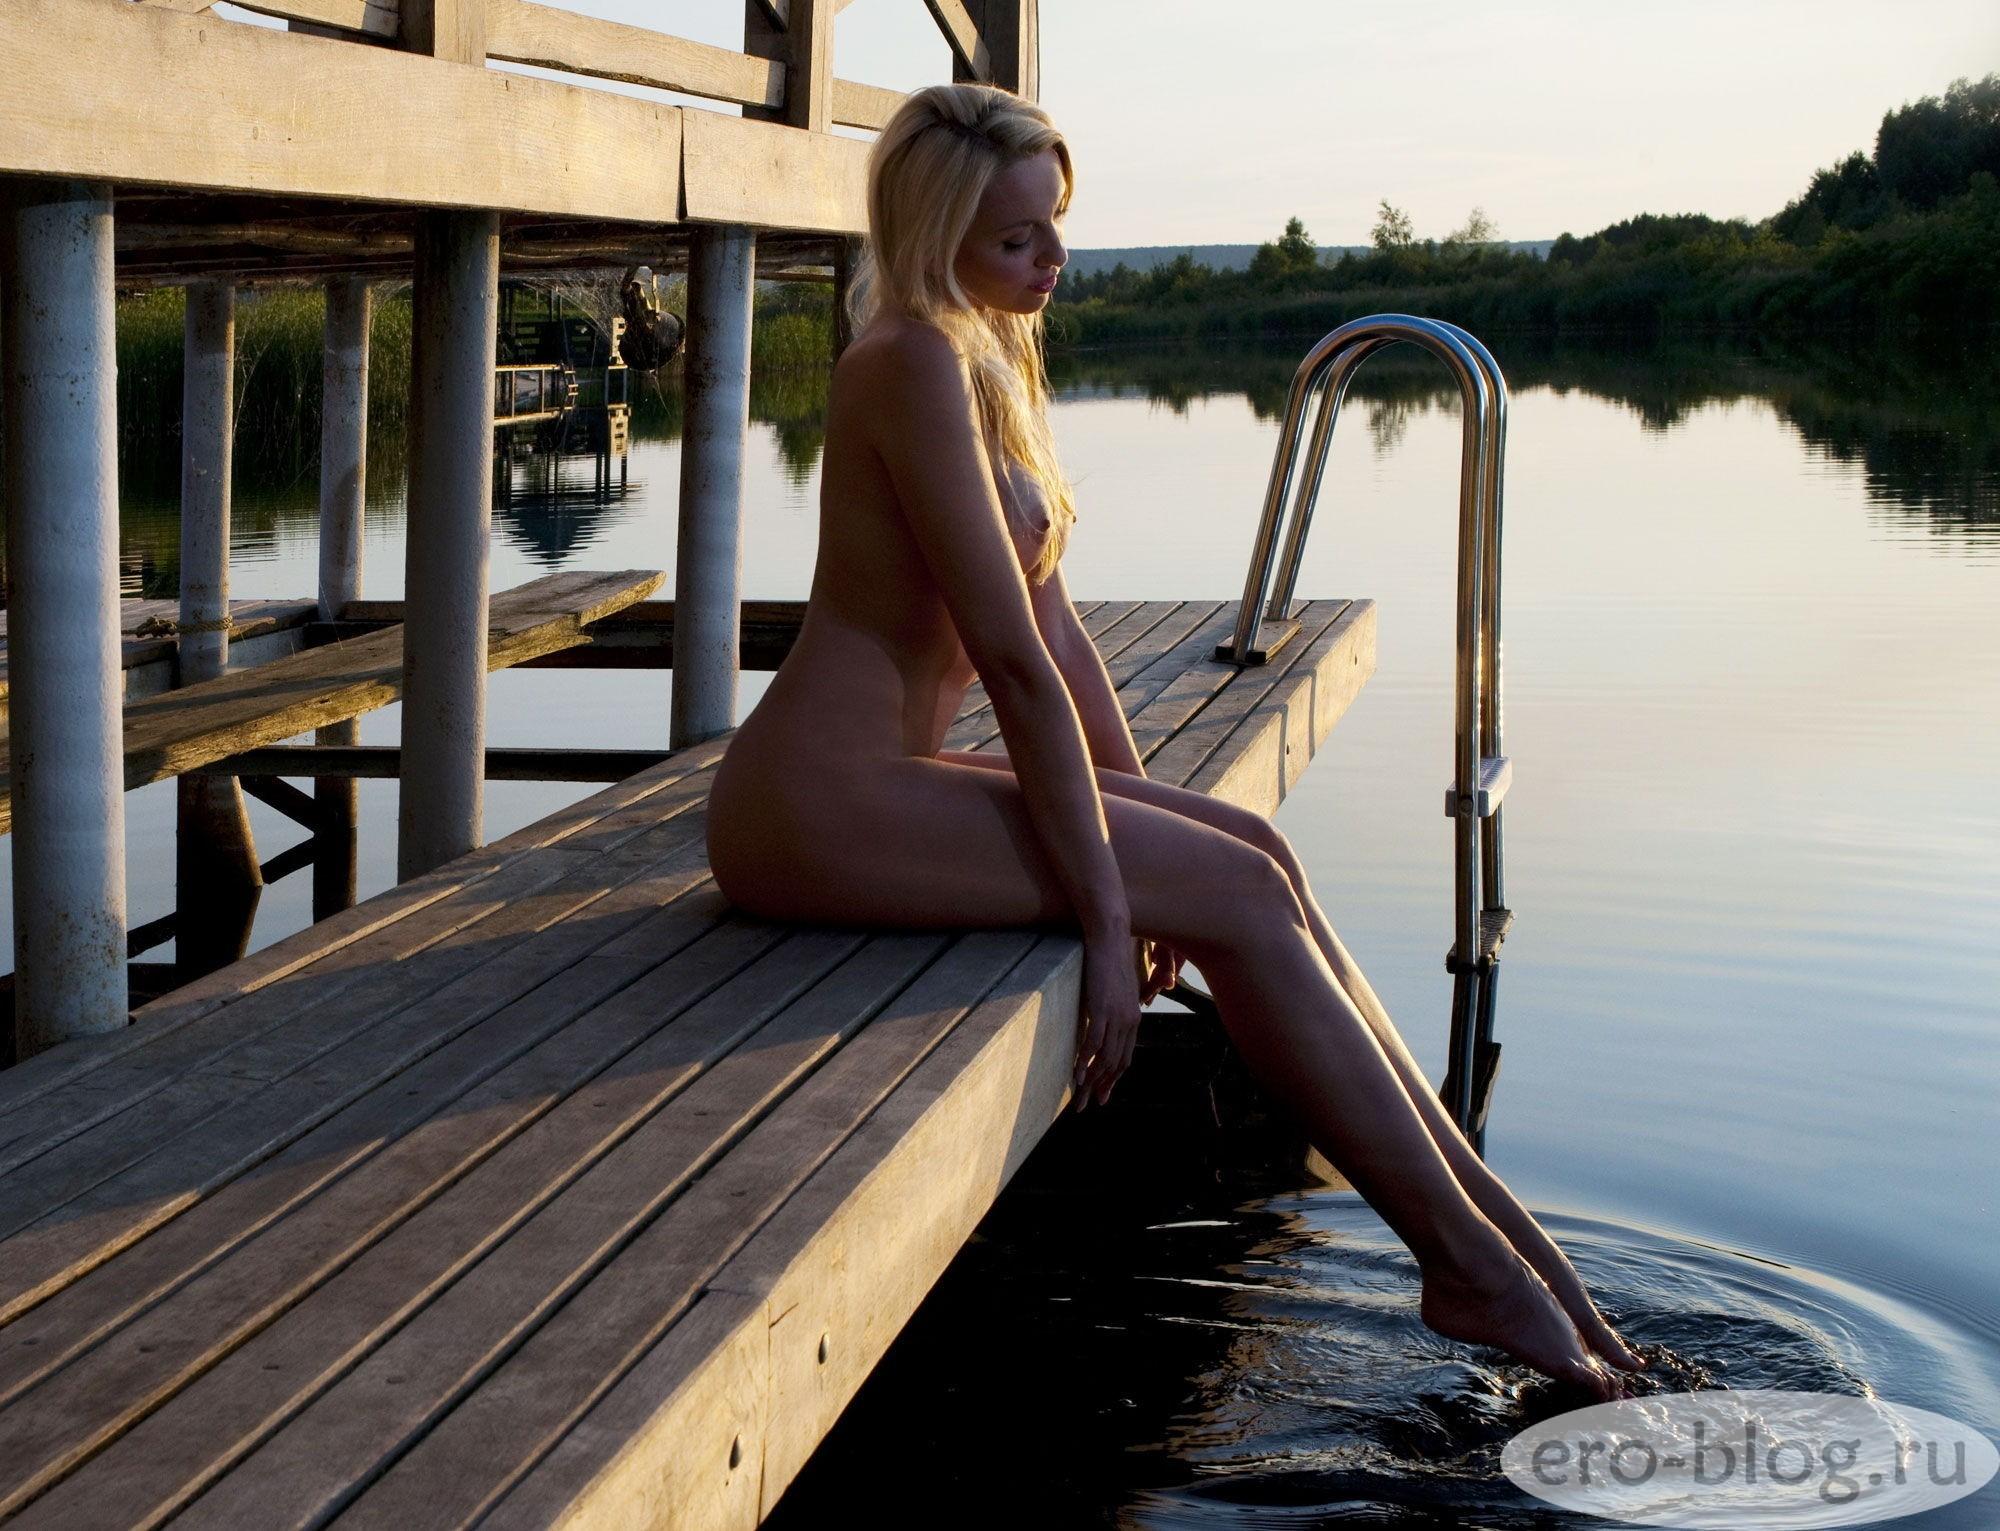 Голая обнаженная Оля Полякова интимные фото звезды